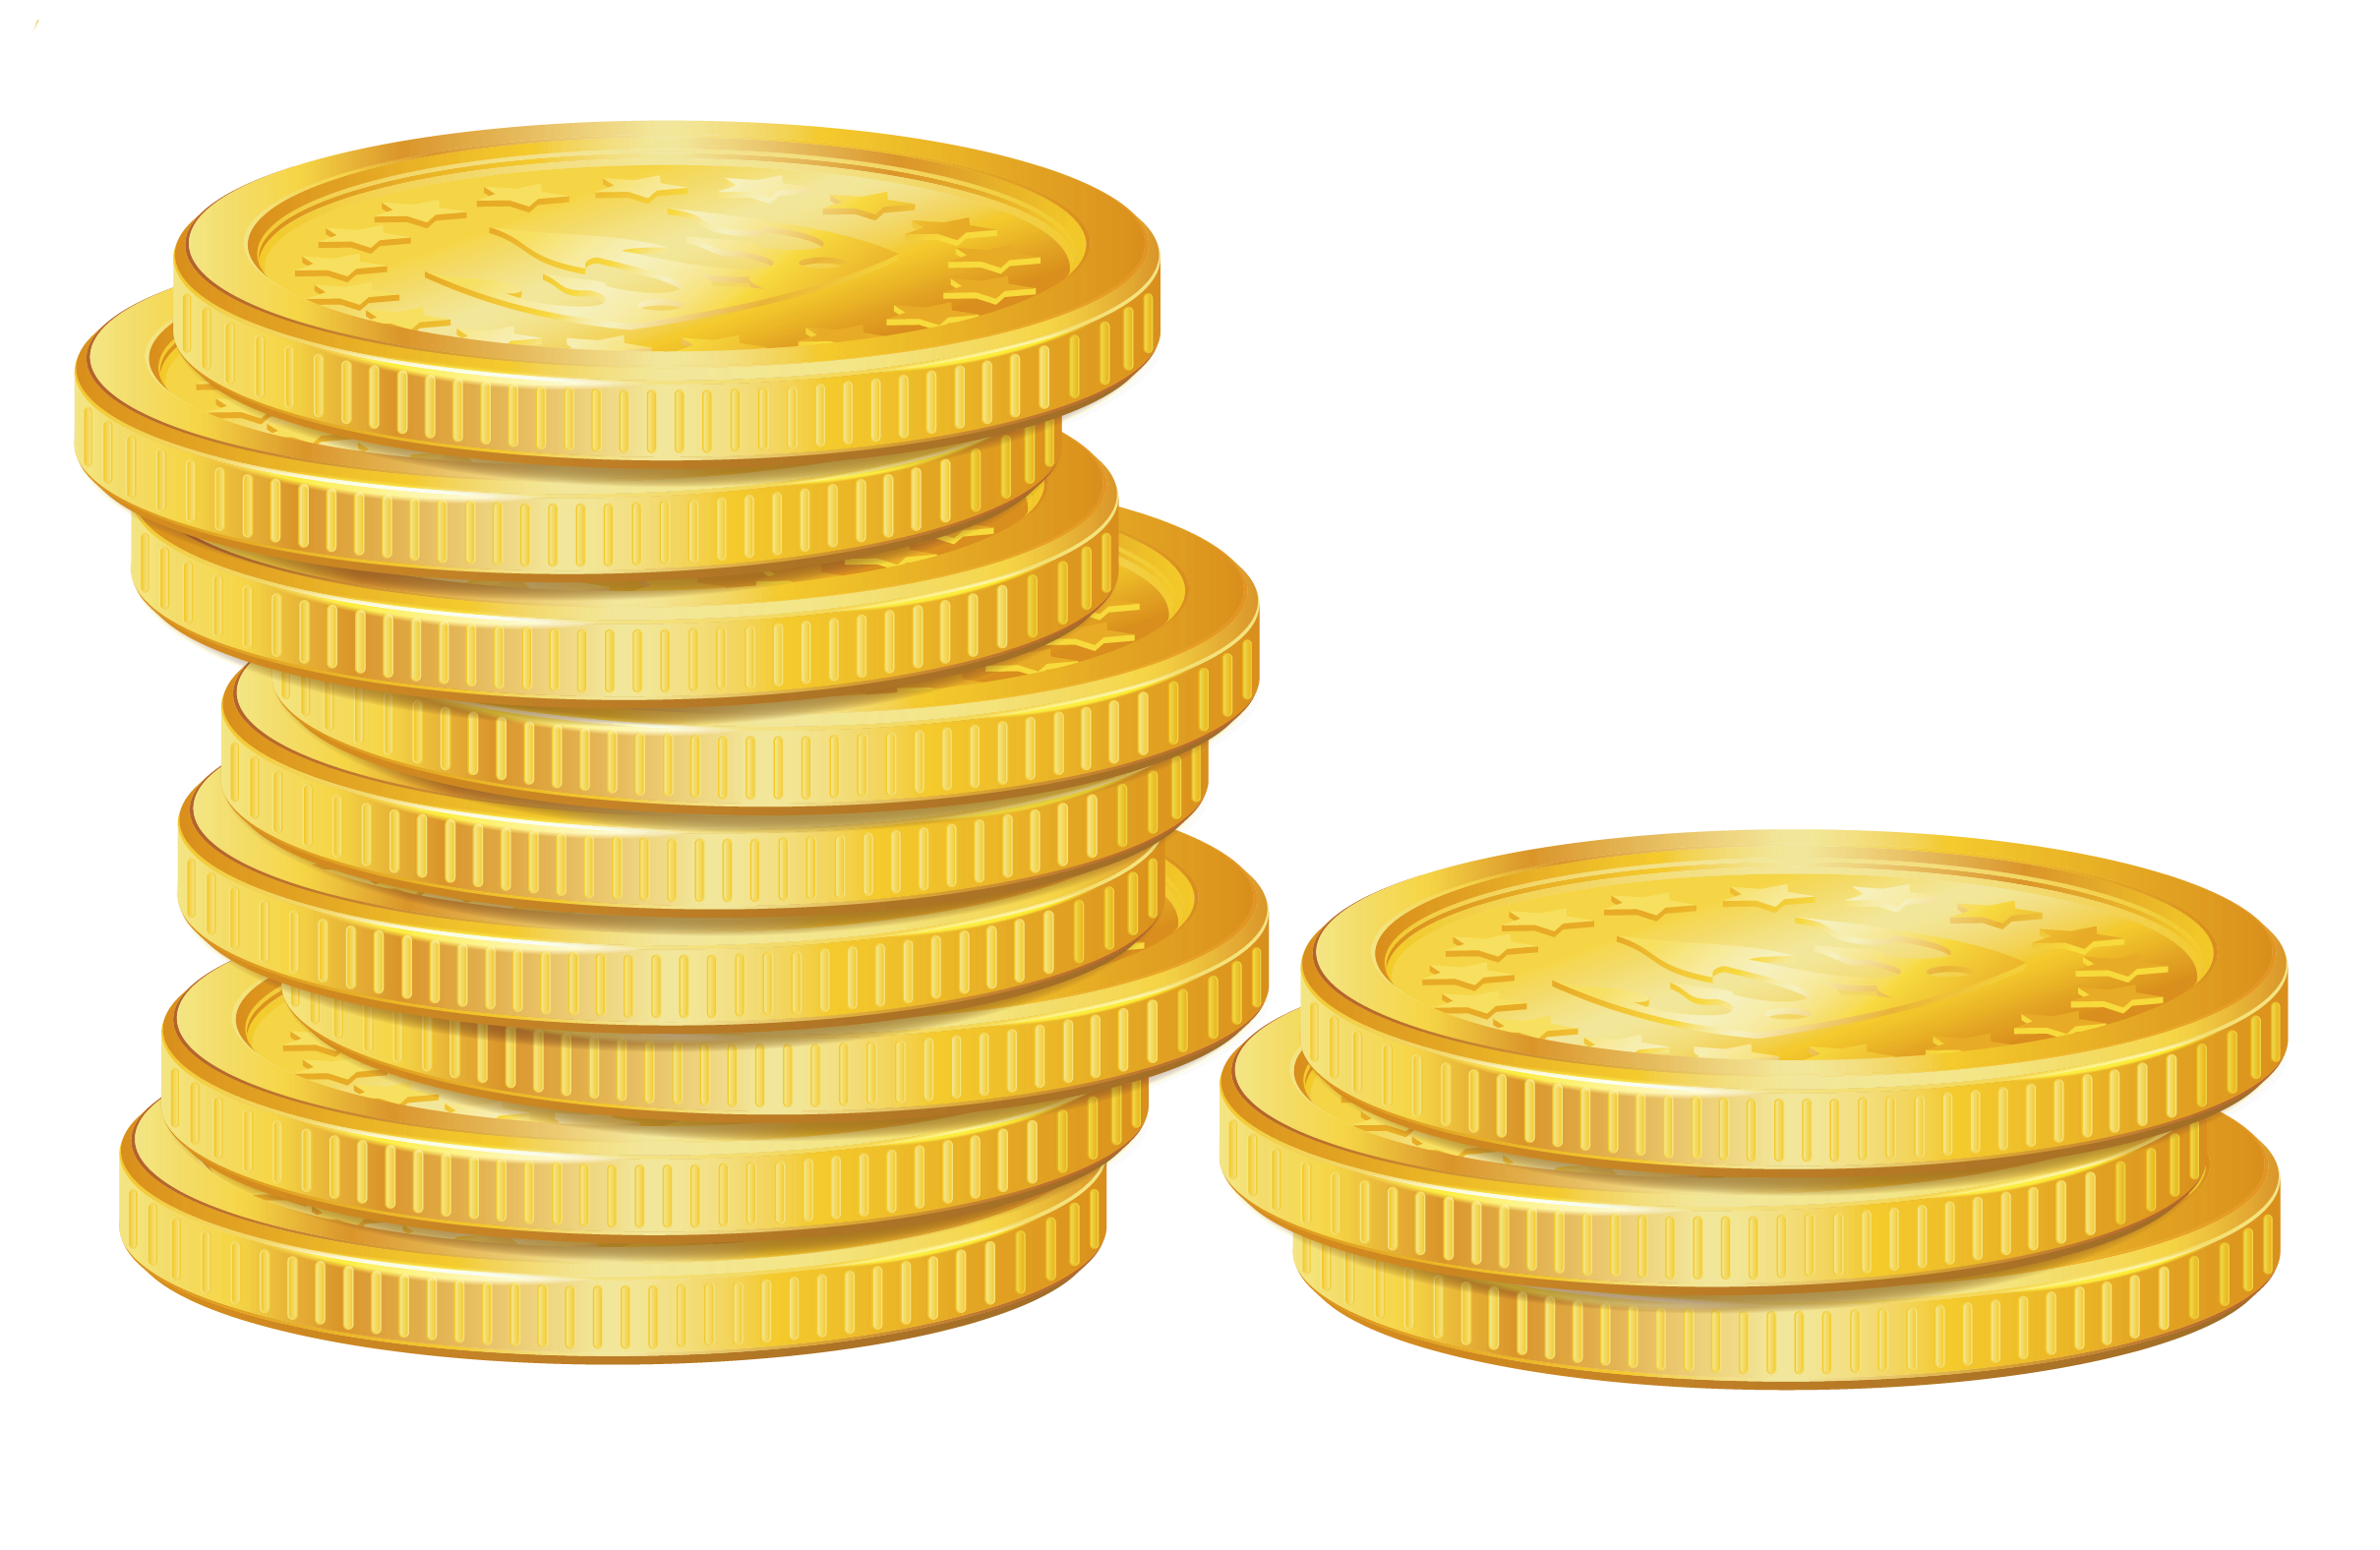 Coin clipart stack coin Money Art collection Coin clipart